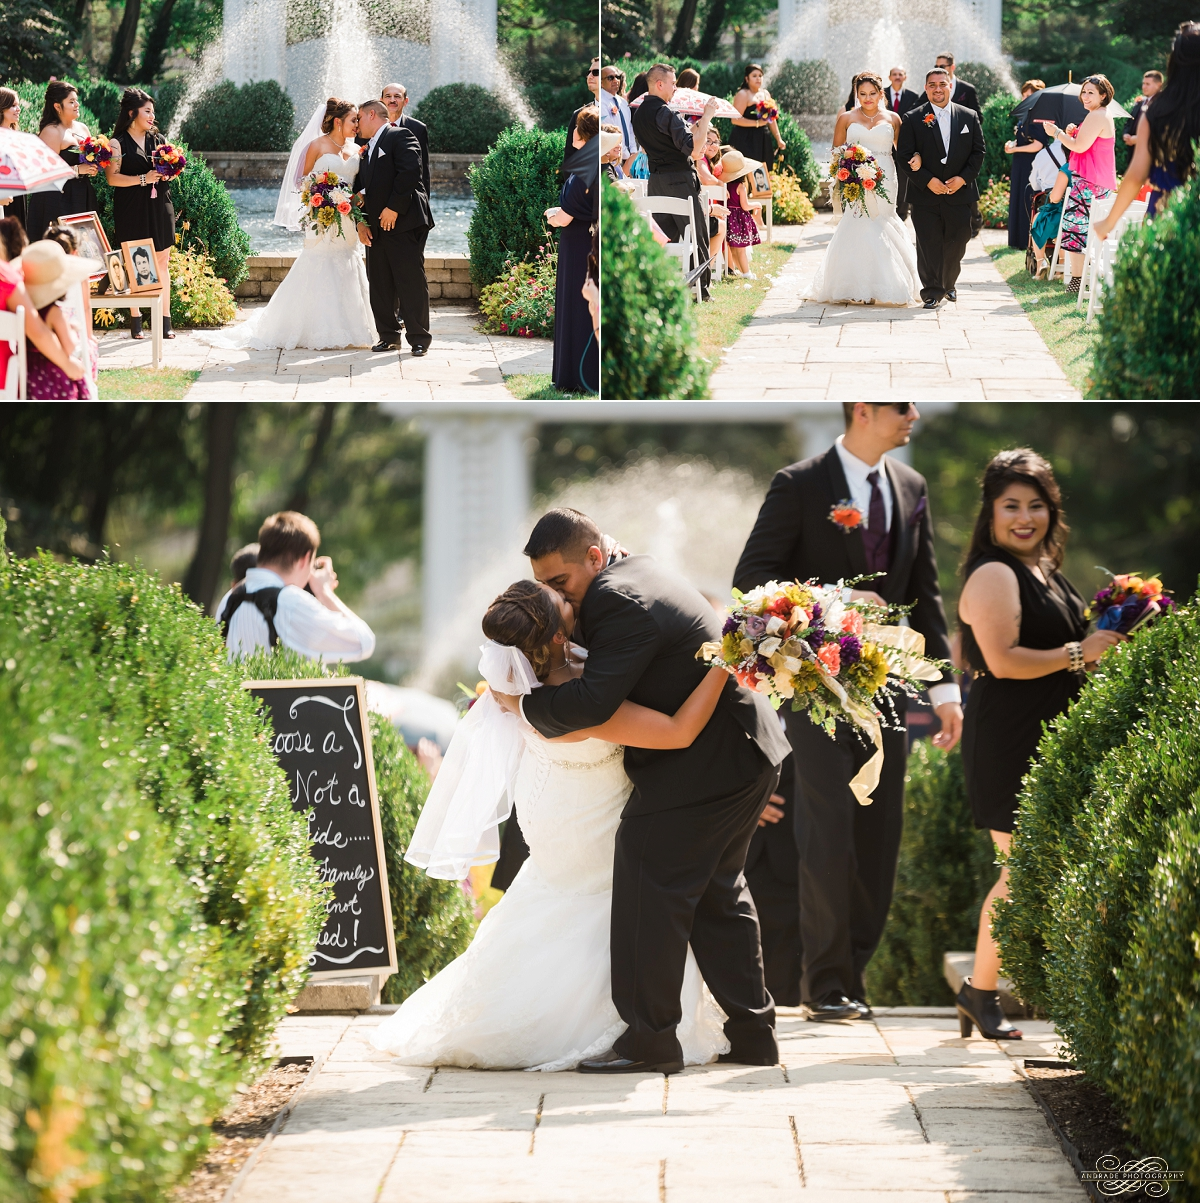 Janette + Louie Estebans Wedding Photography in Naperville - Naperville Wedding Photographer_0080.jpg